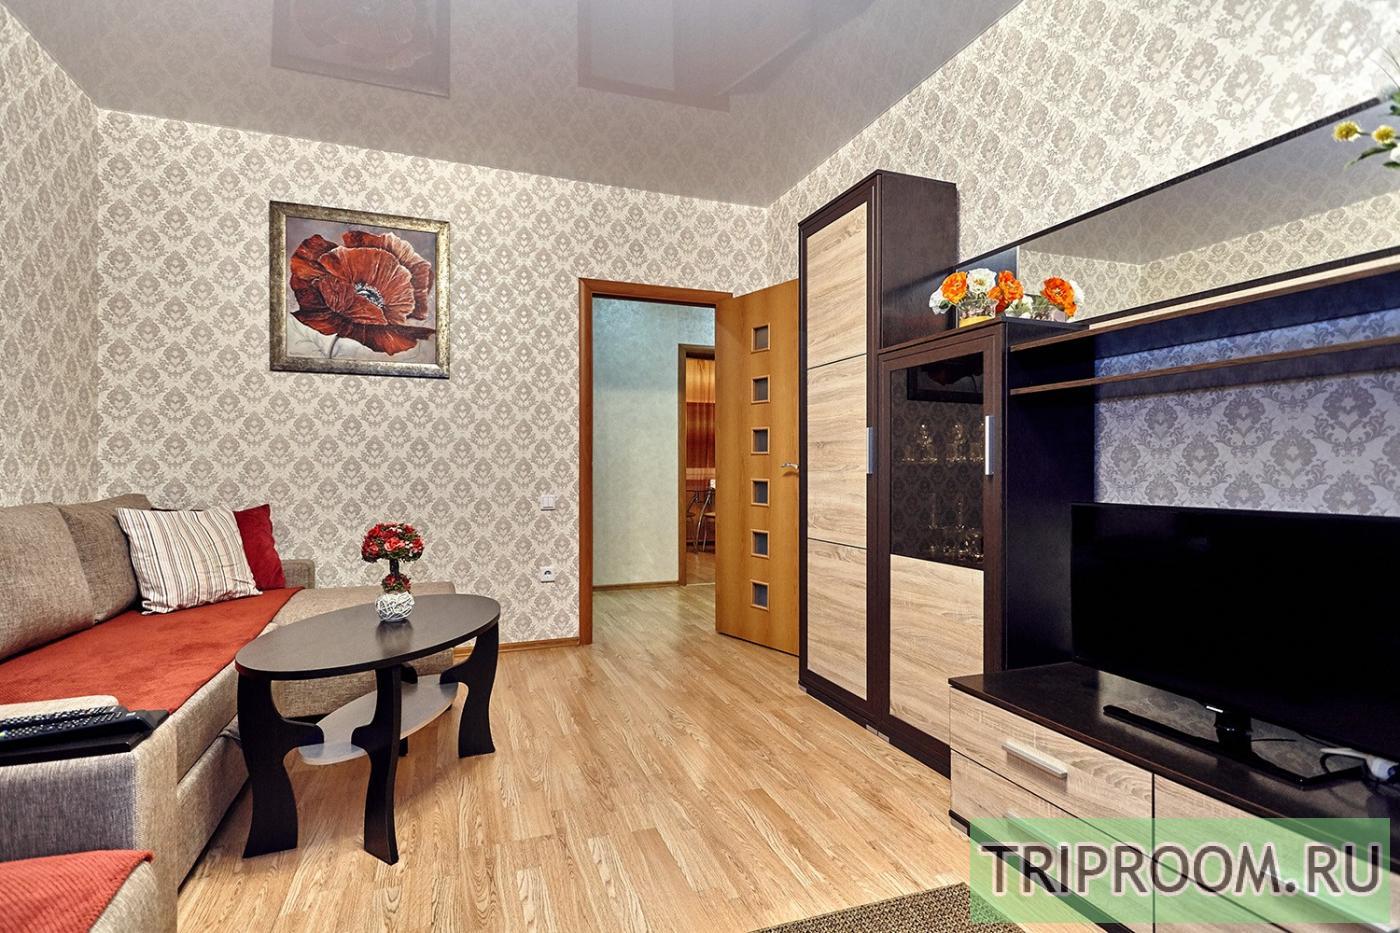 2-комнатная квартира посуточно (вариант № 10581), ул. Соколова улица, фото № 6